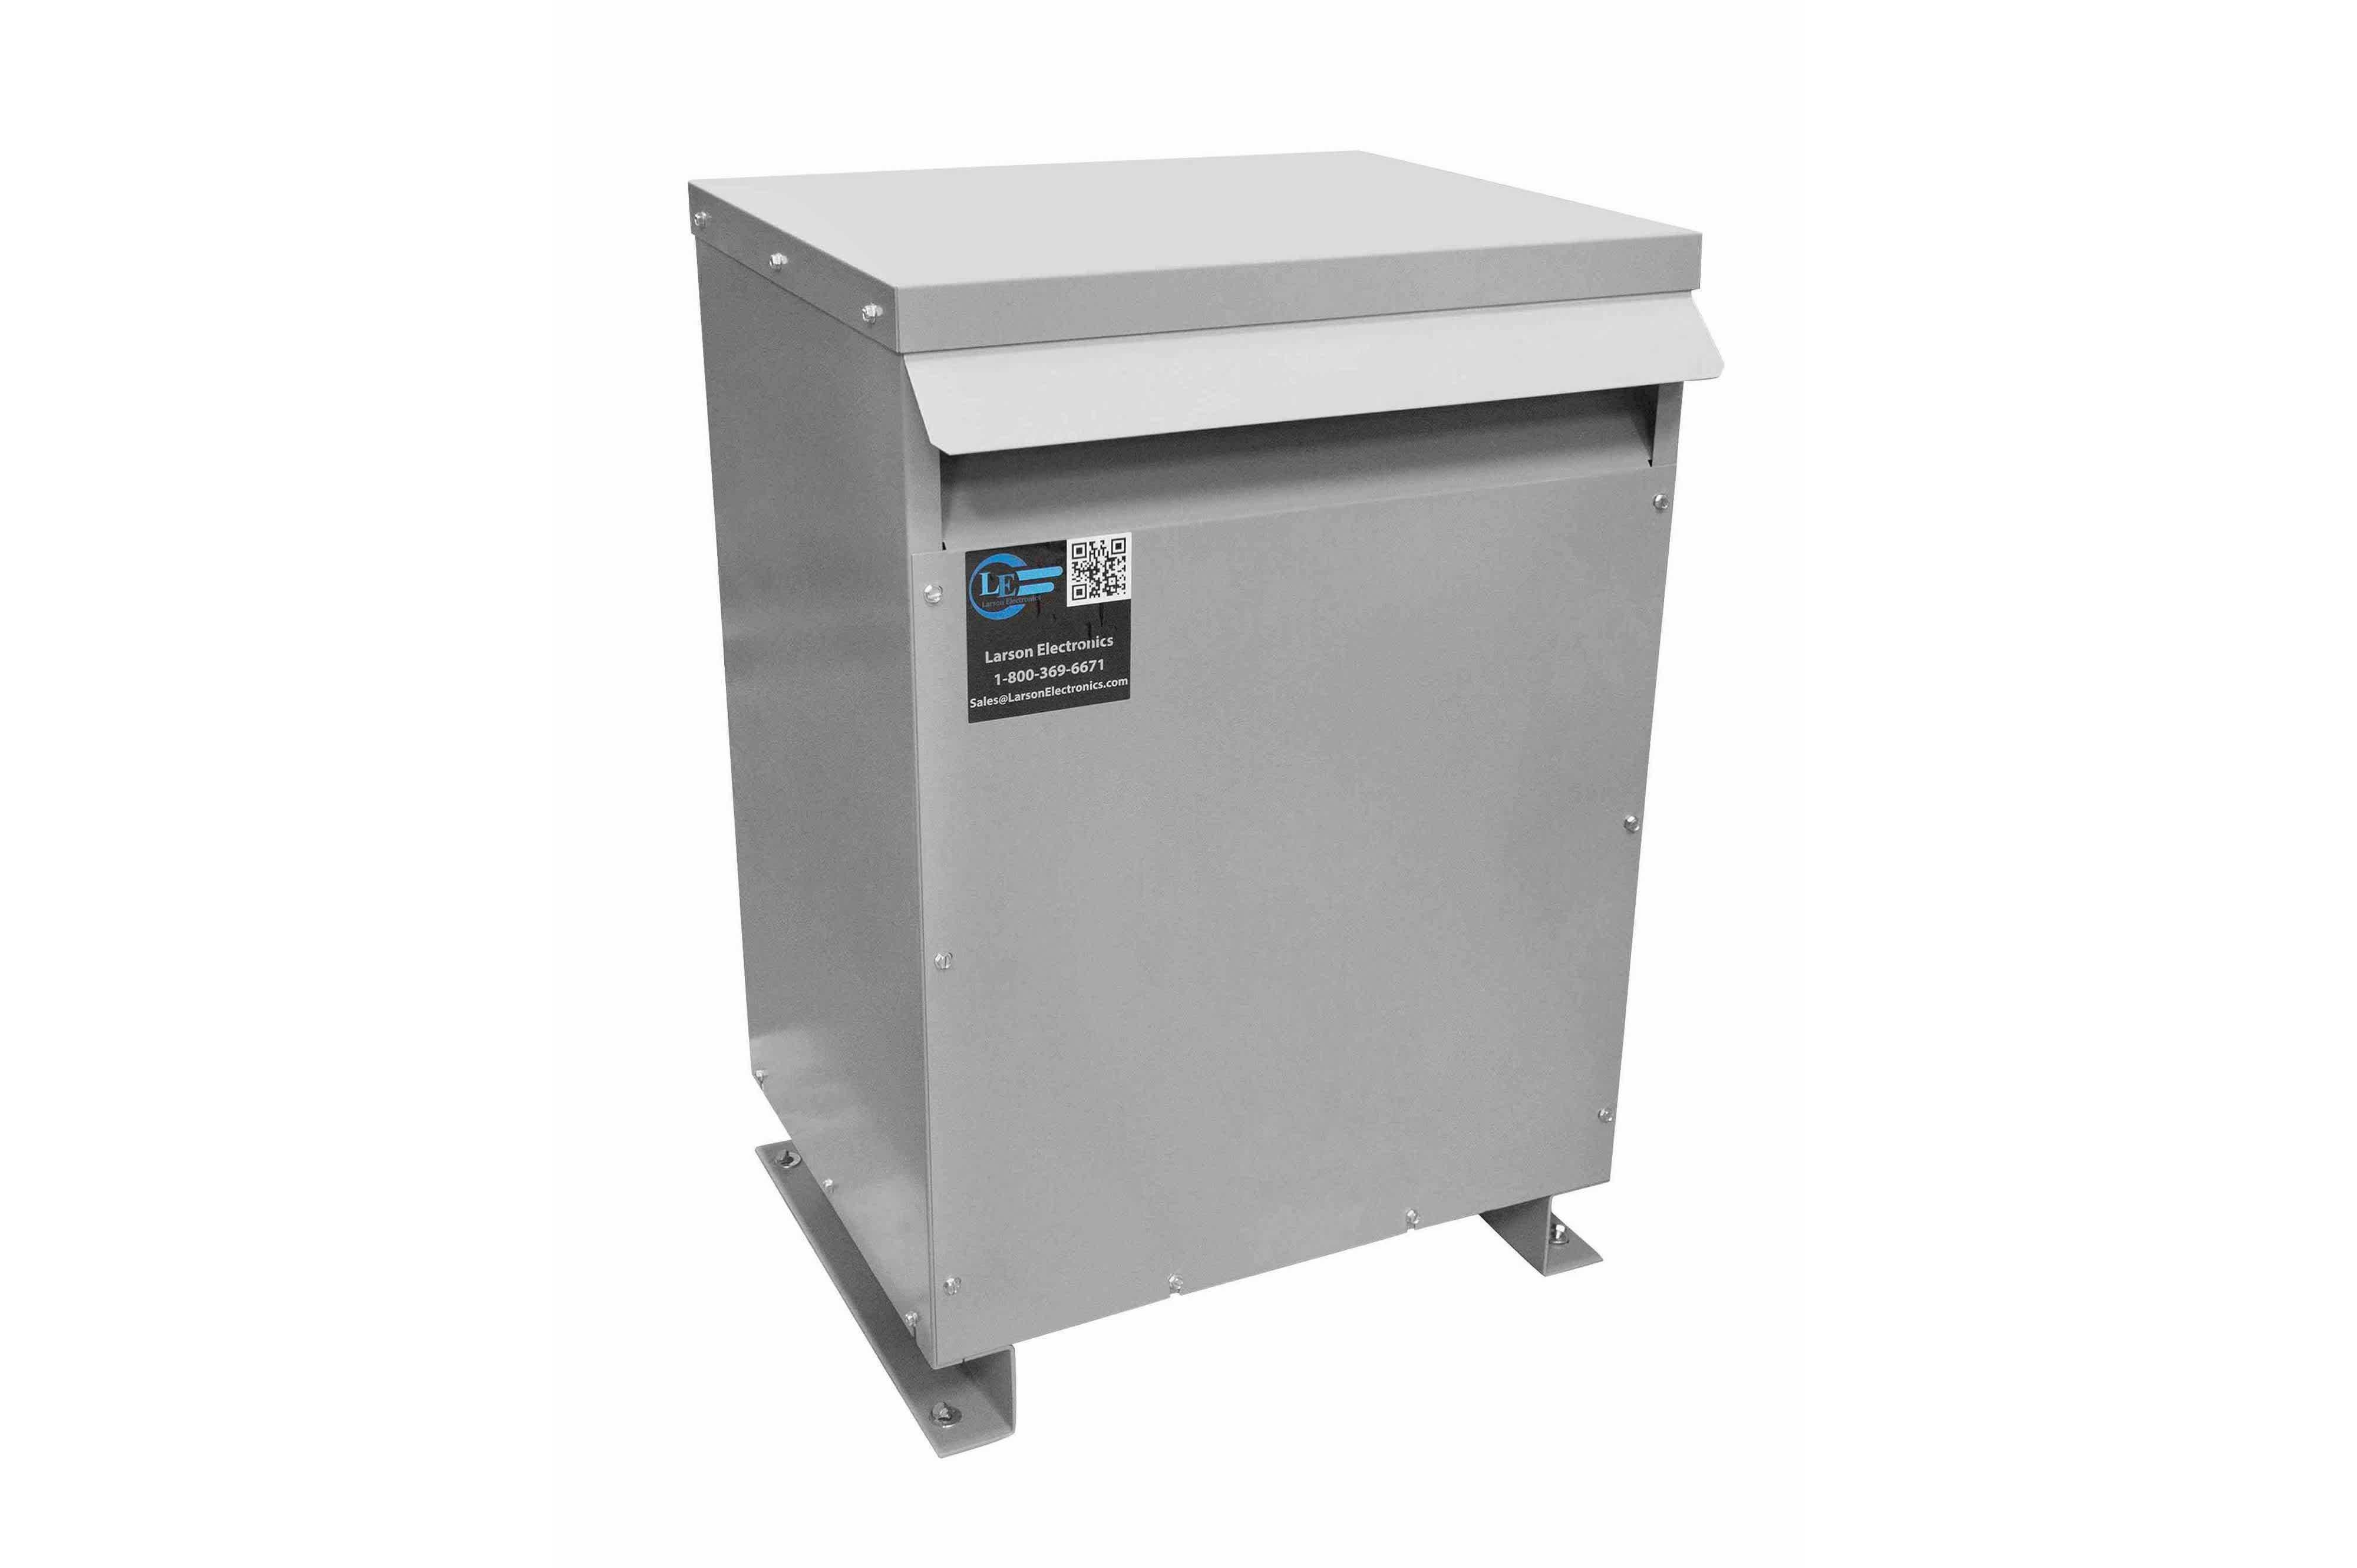 80 kVA 3PH Isolation Transformer, 575V Wye Primary, 480Y/277 Wye-N Secondary, N3R, Ventilated, 60 Hz